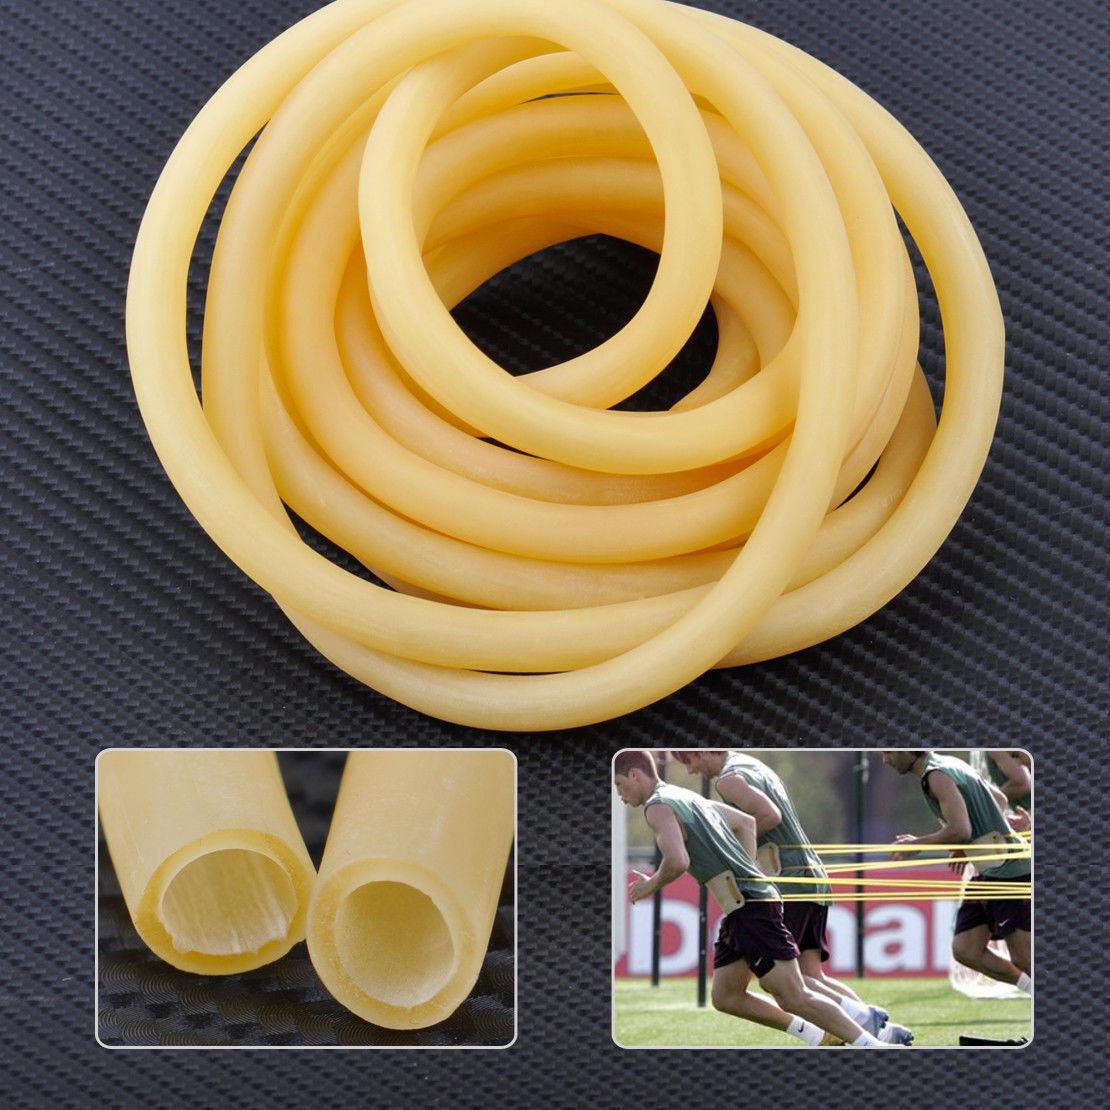 6mm tubo de borracha látex natural faixas de mangueira cirúrgica para estilingue caça catapulta fitness yoga arco acessórios 3m 6mm x 9mm